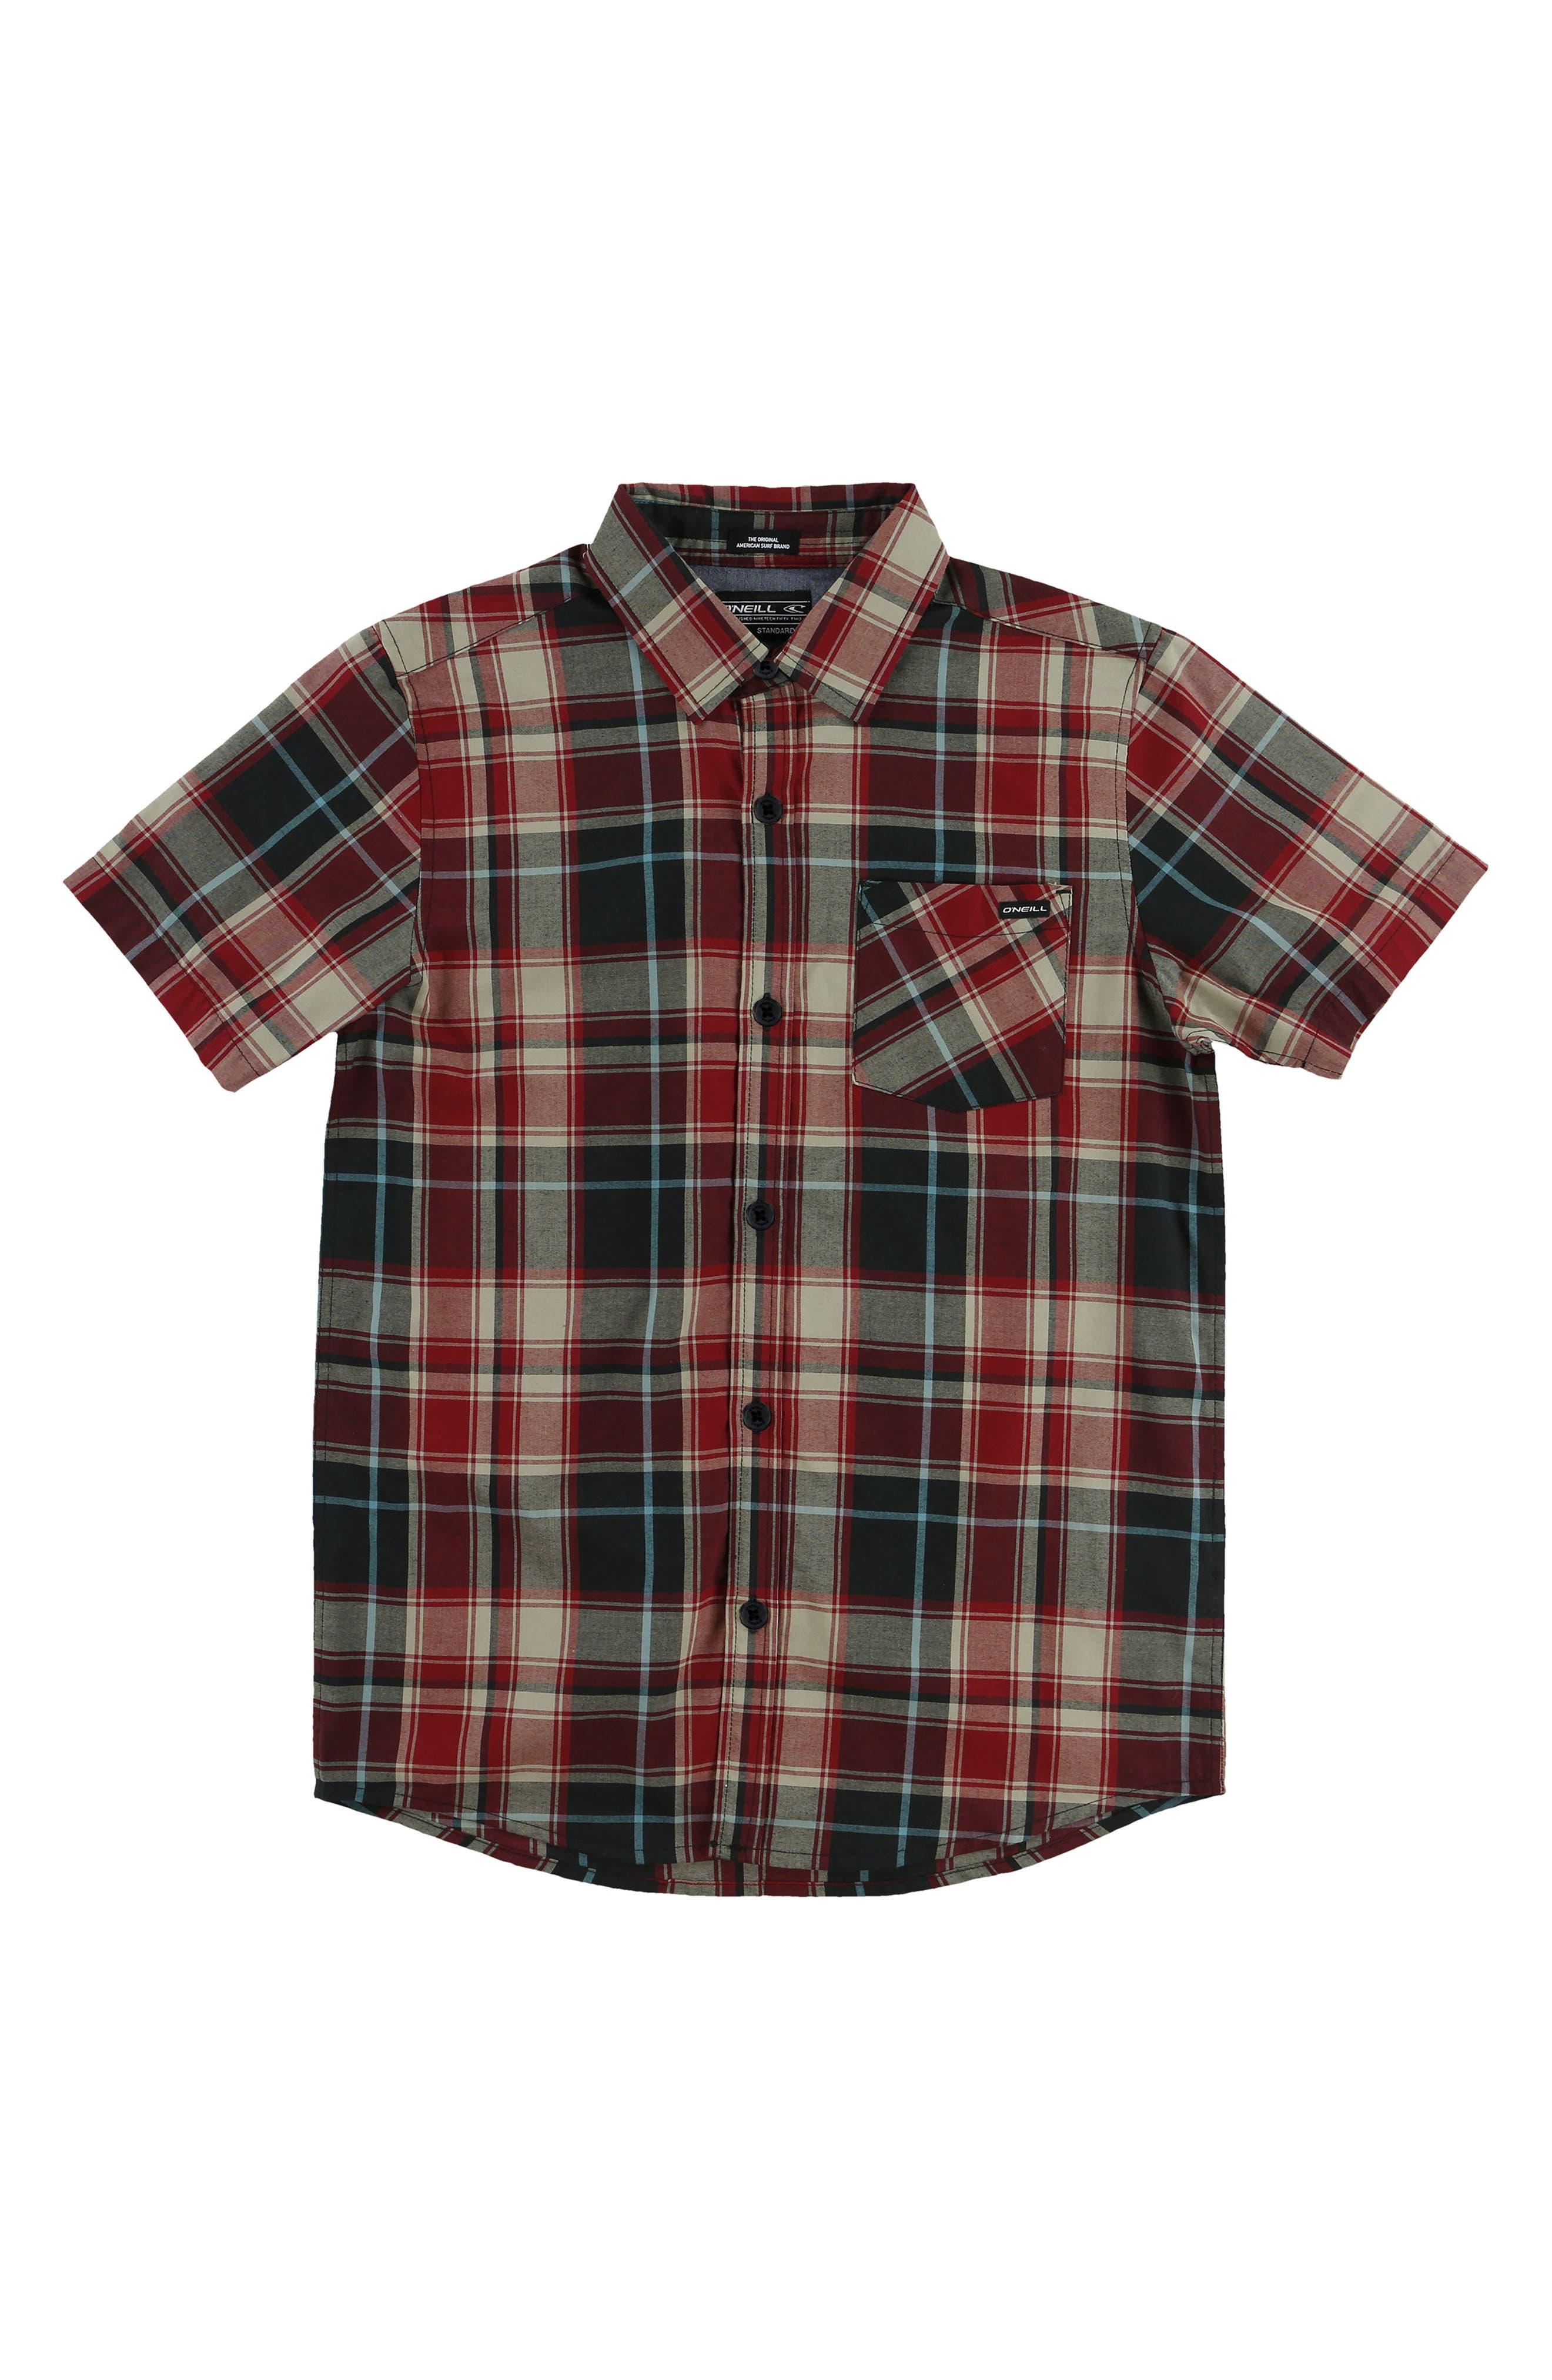 Main Image - O'Neill Plaid Short Sleeve Shirt (Big Boys)